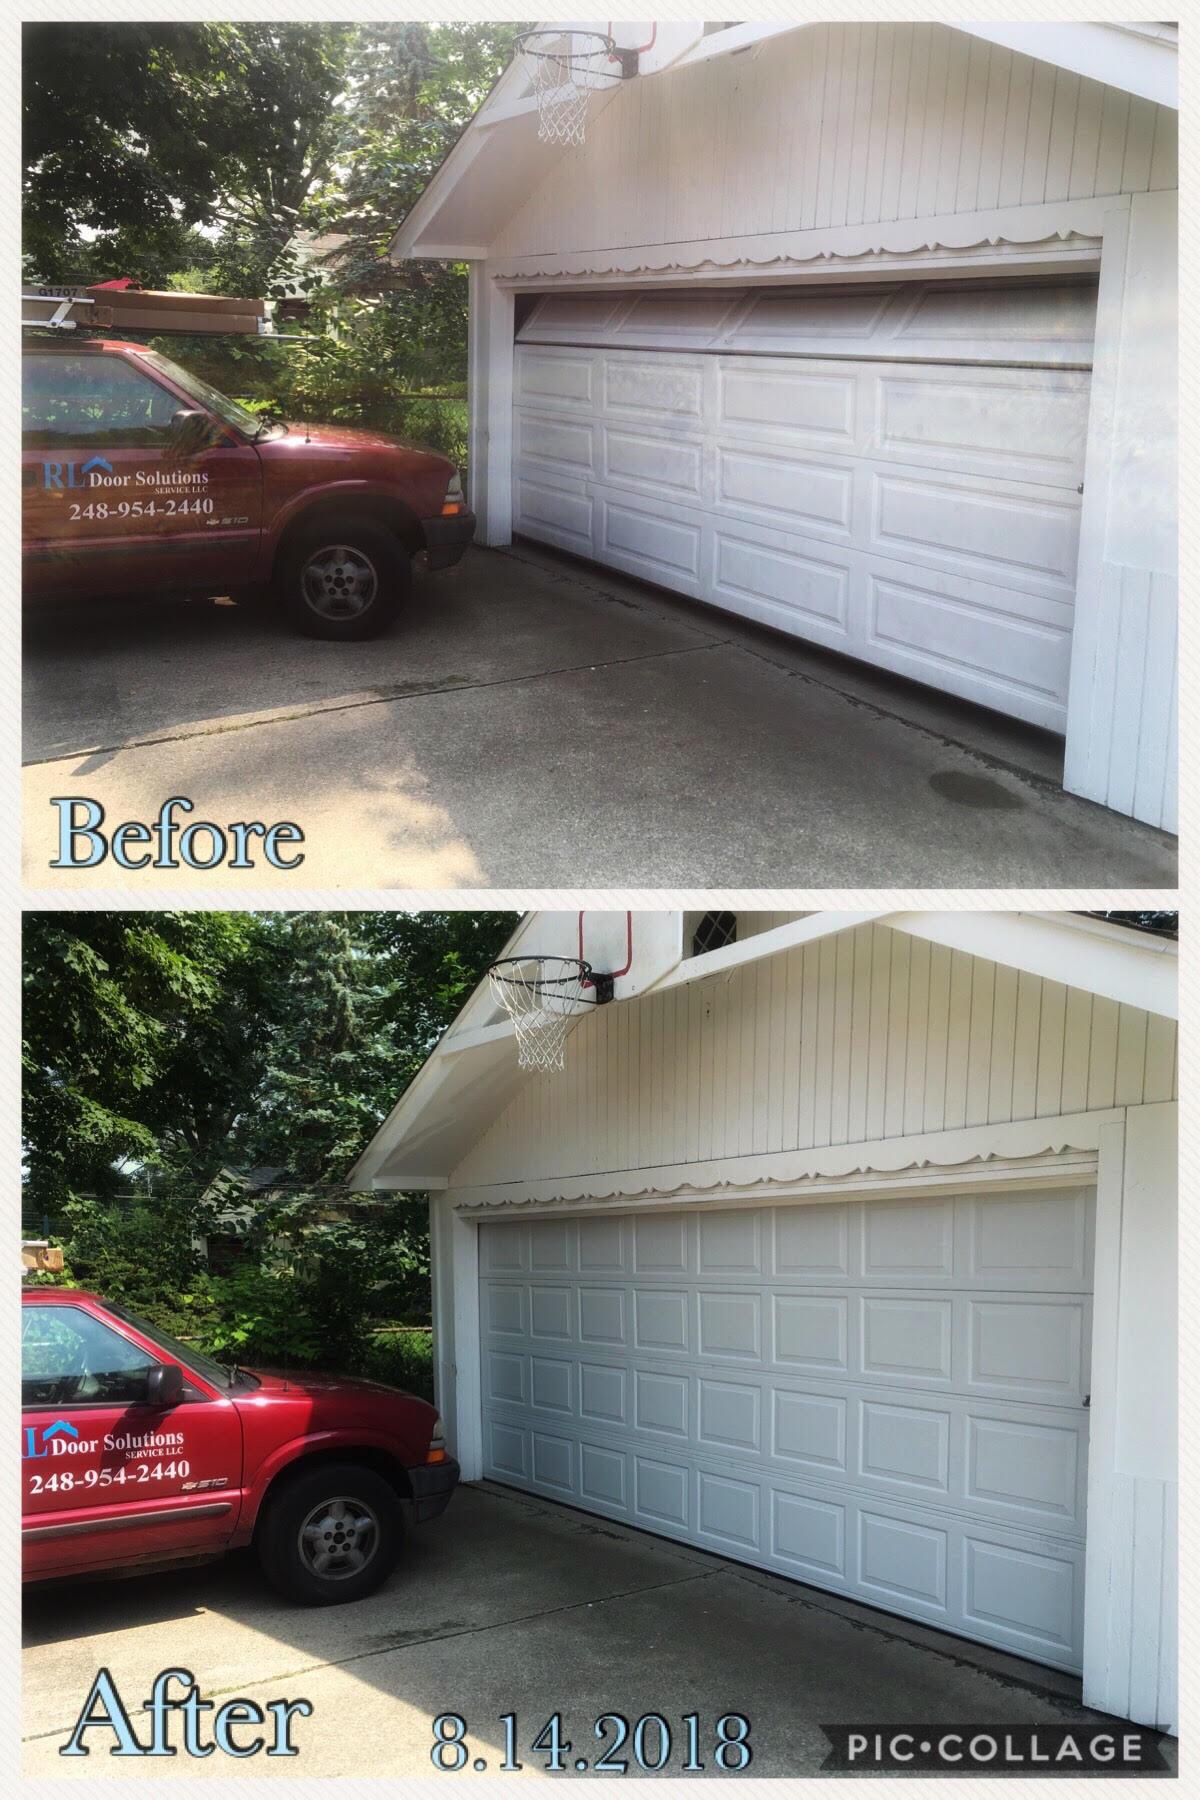 Rl Garage Door Solutions Service Llc Farmington Hills Mi Garage